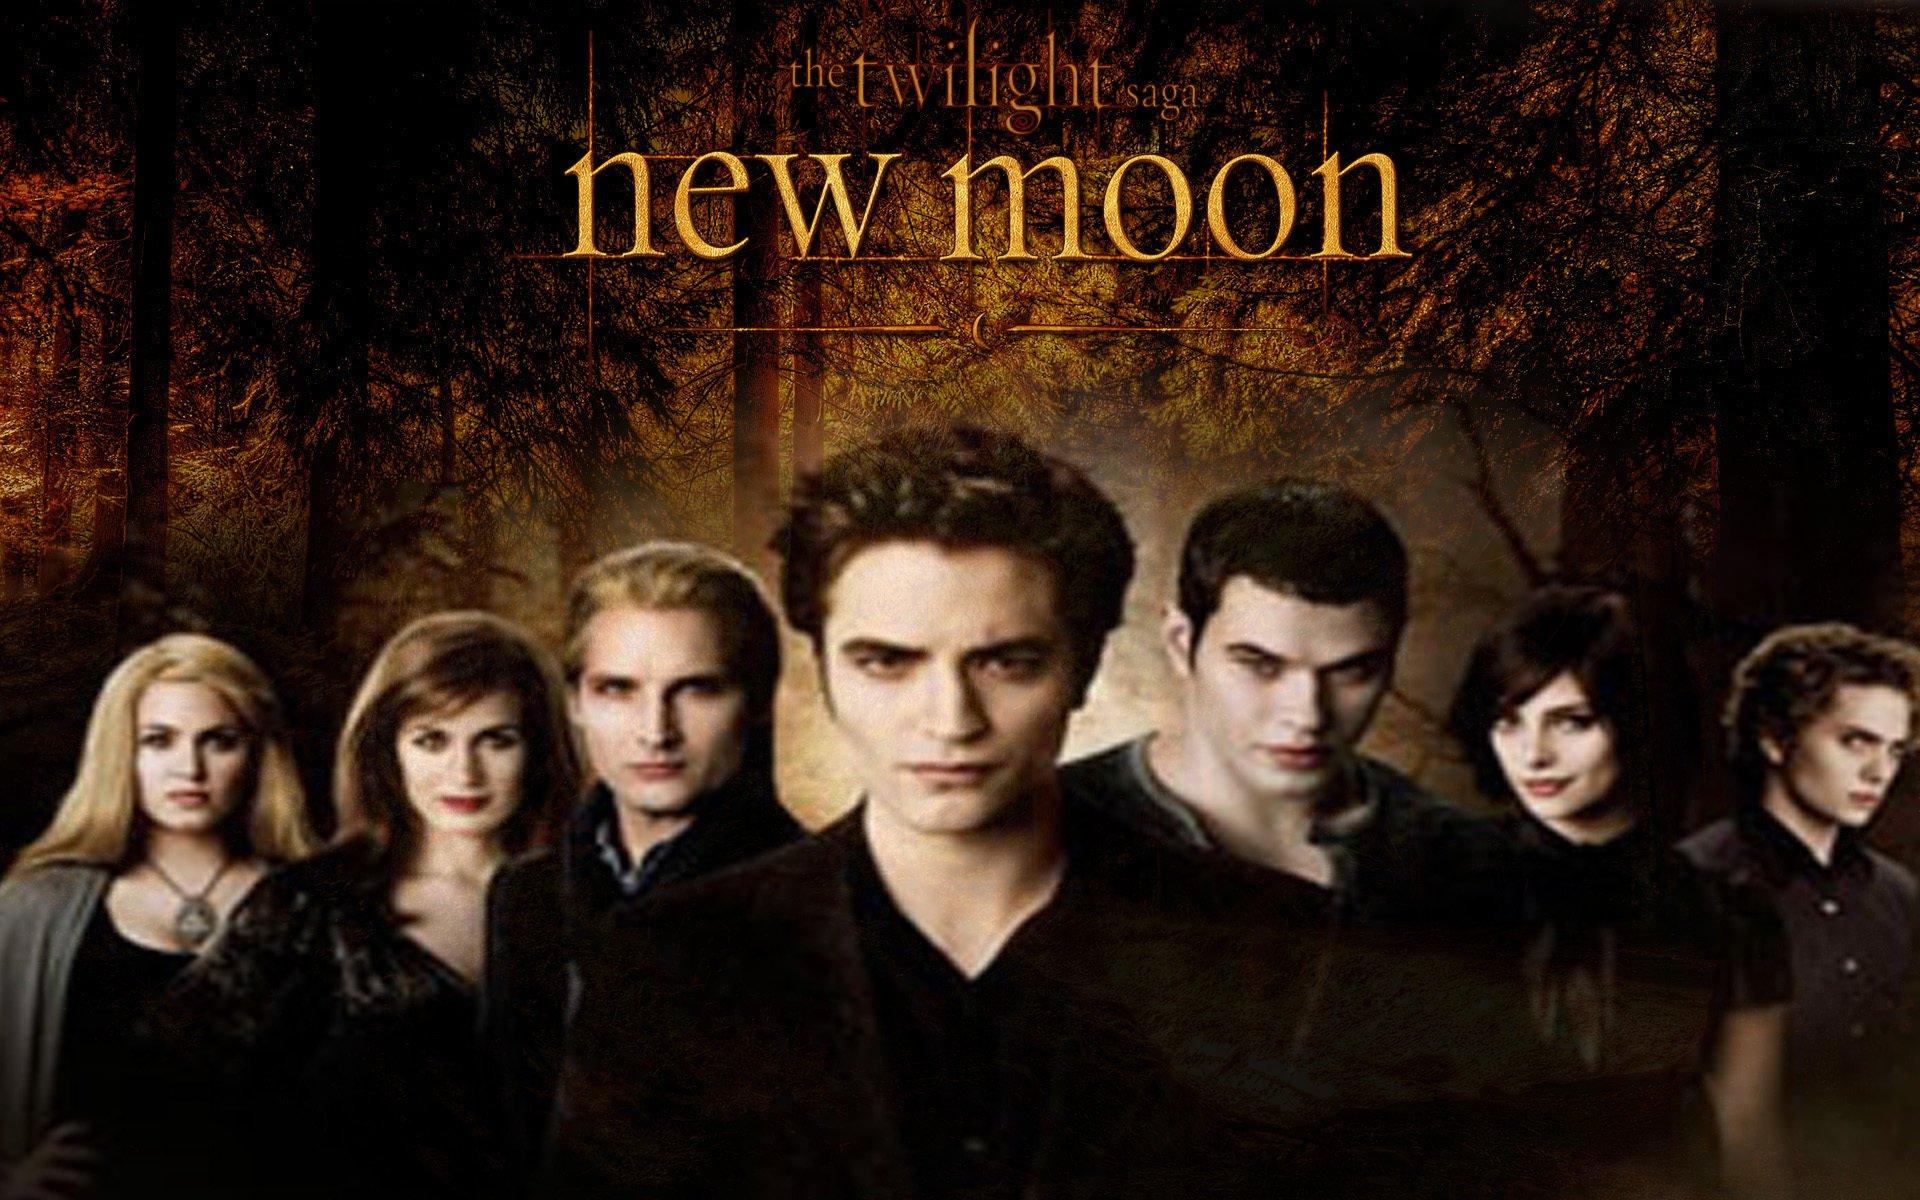 Twilight saga drama fantasy romance movie film vampire for New moon vampire movie